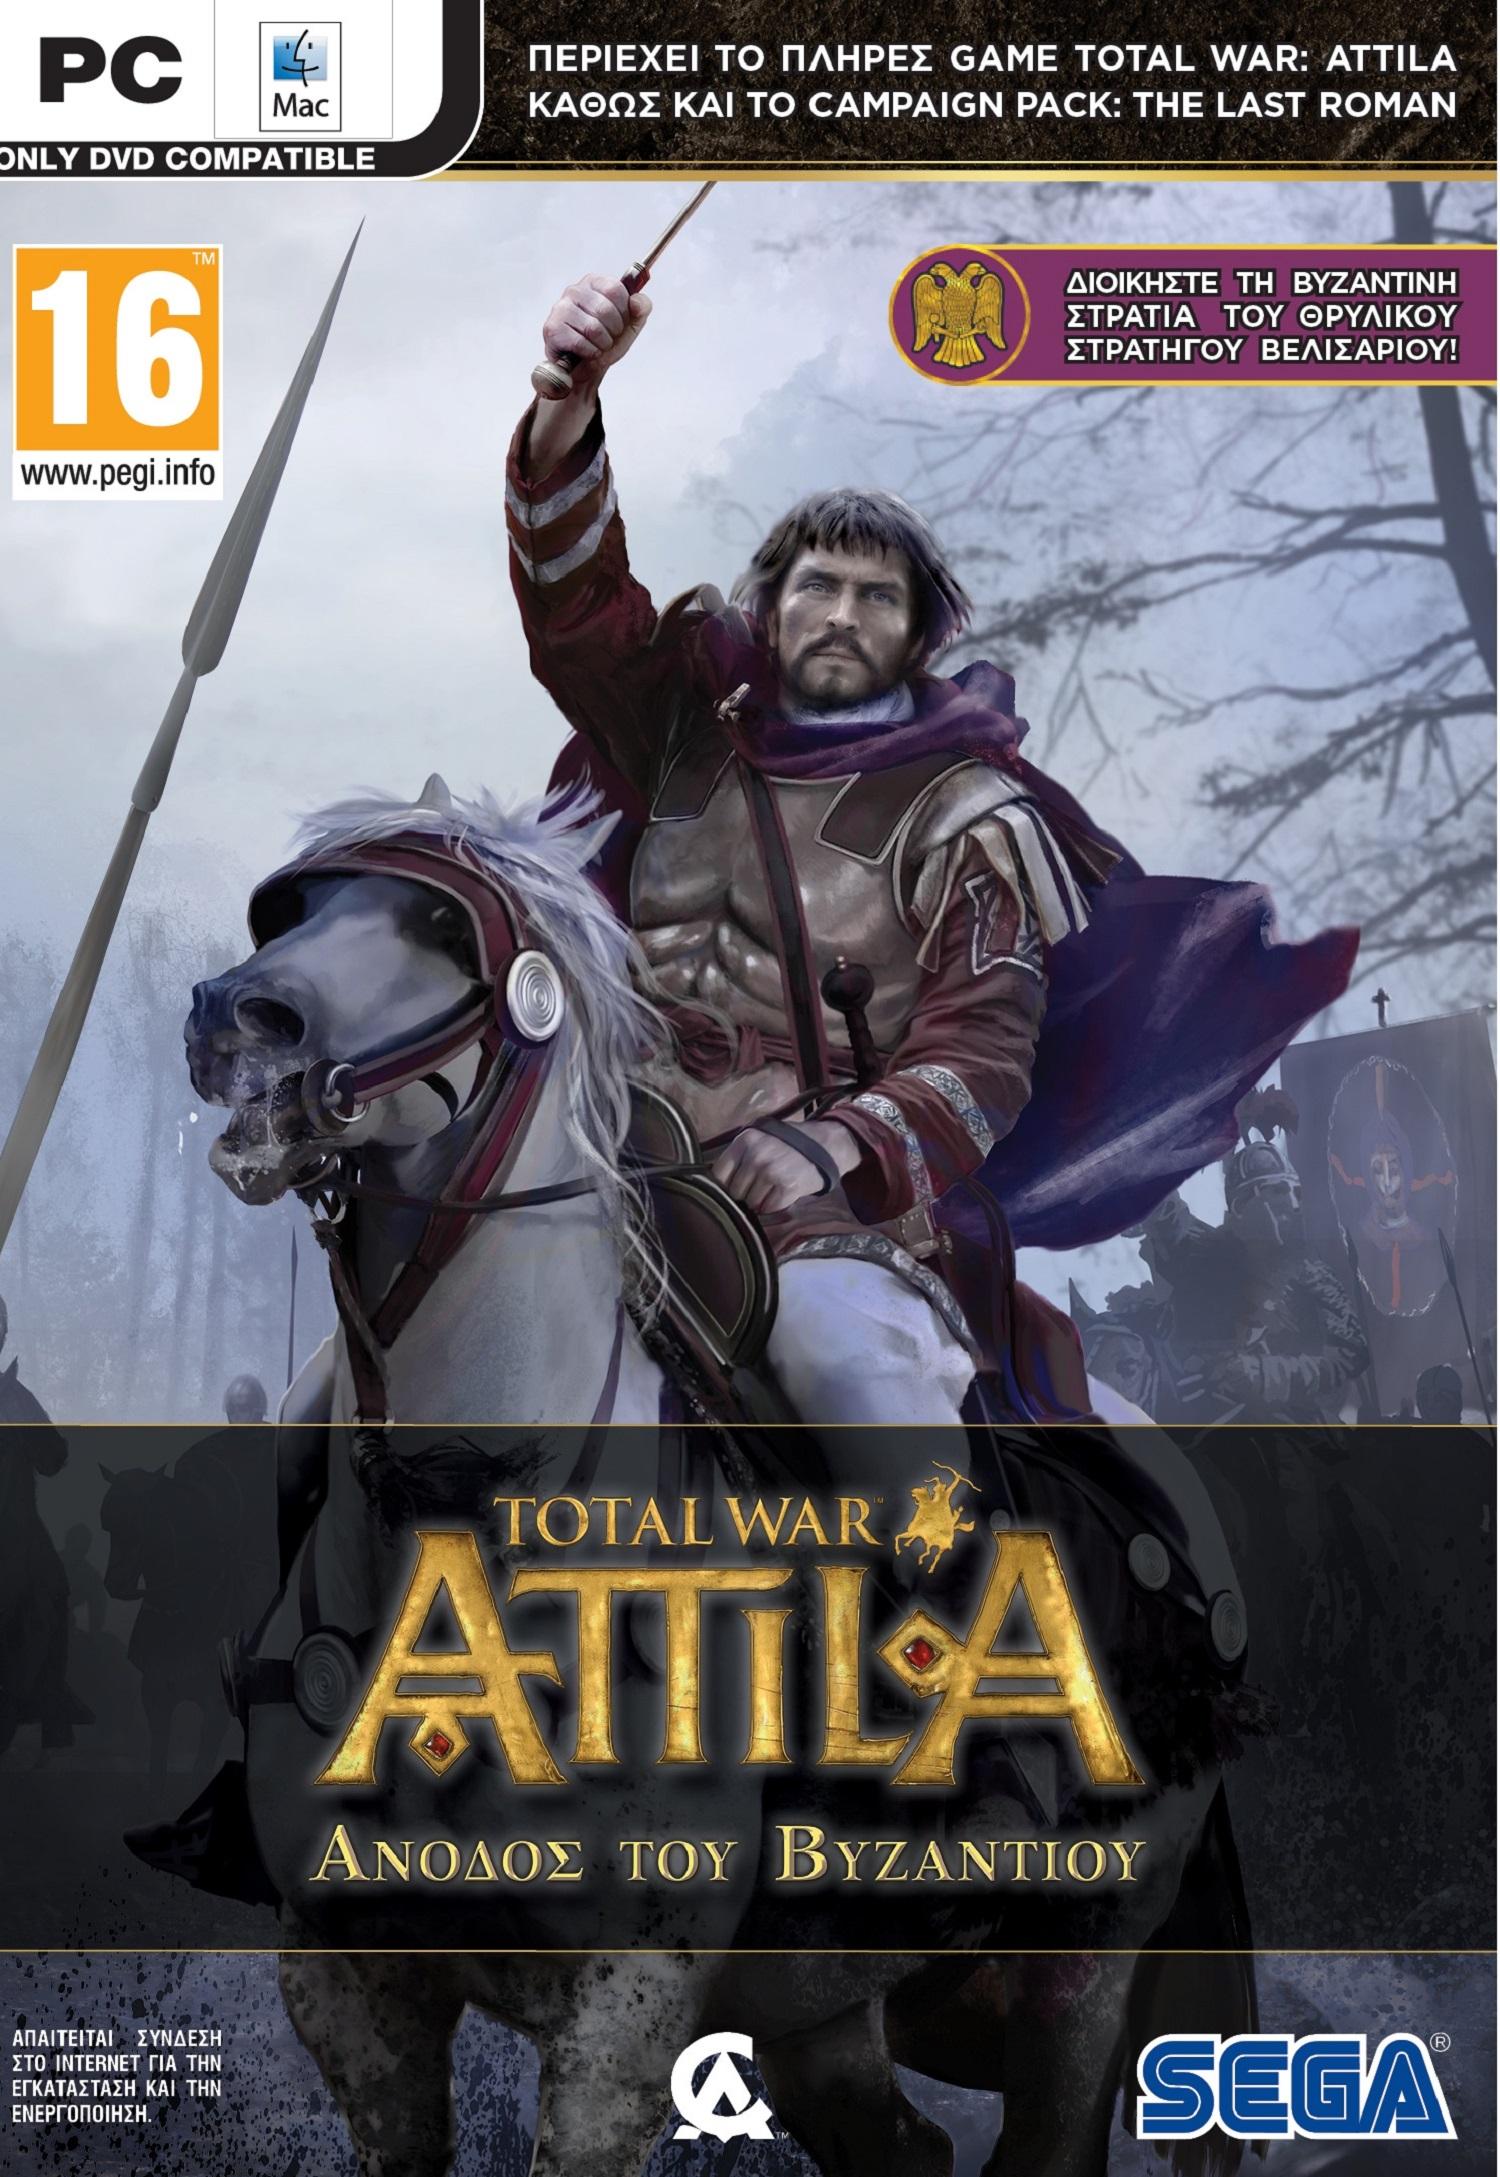 Total War: Attila - RISE OF BYZANTIUM PC - SEGA 1.18.01.22.058